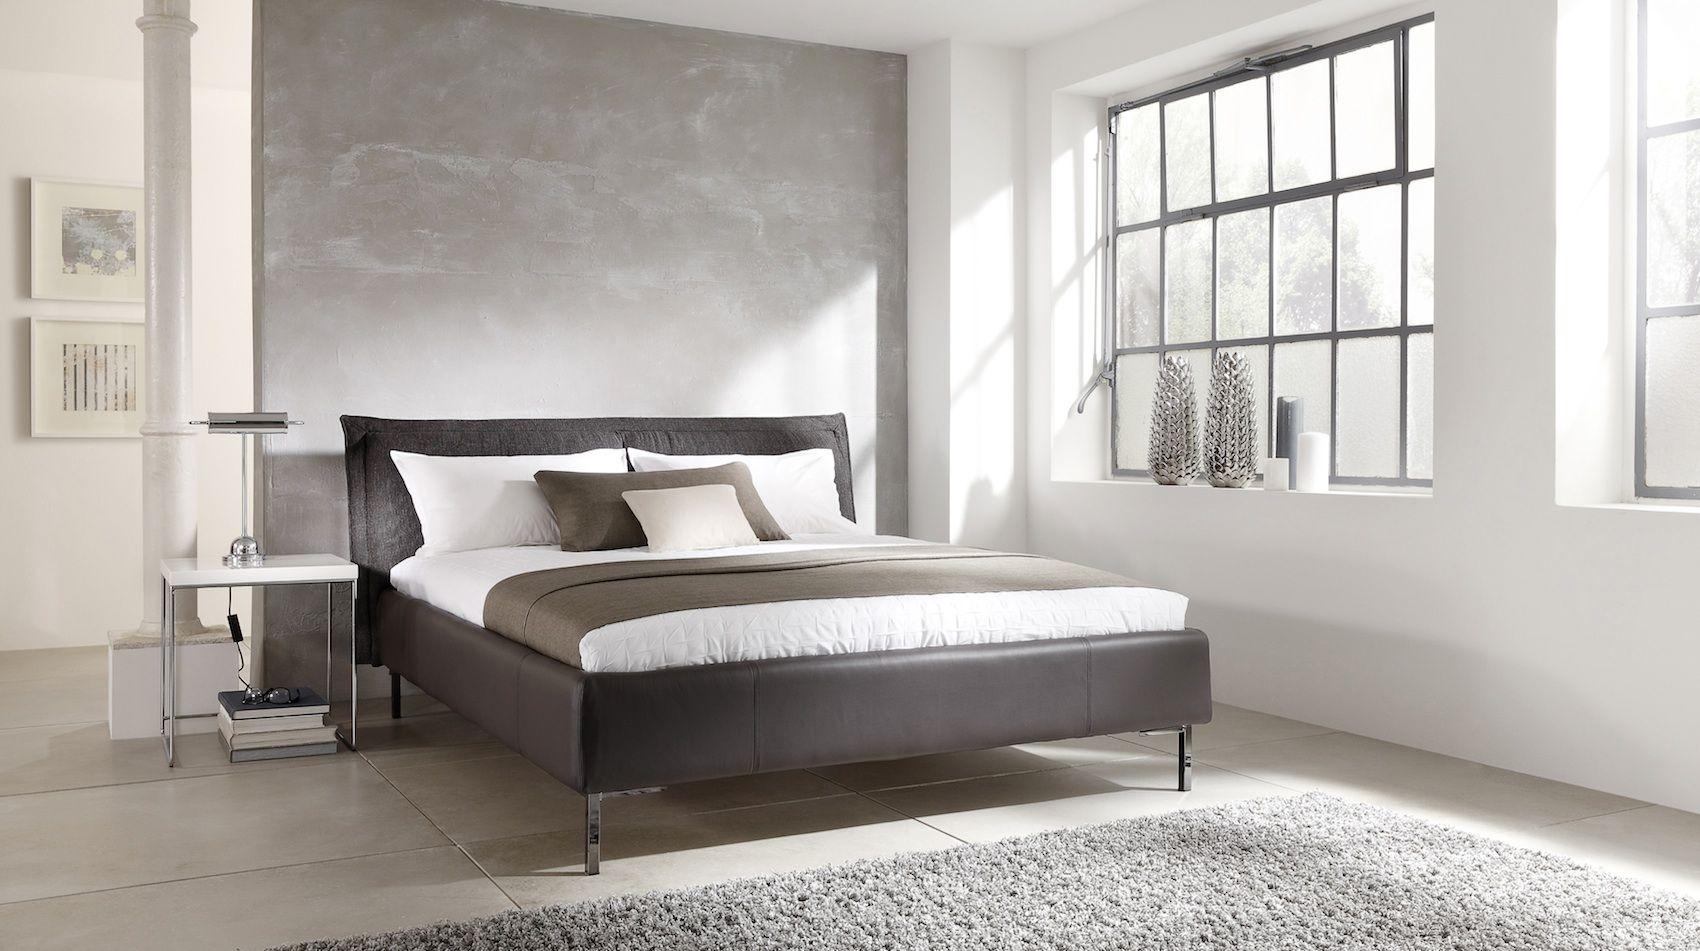 #indomo #bed #design #beds #interior #ID.510